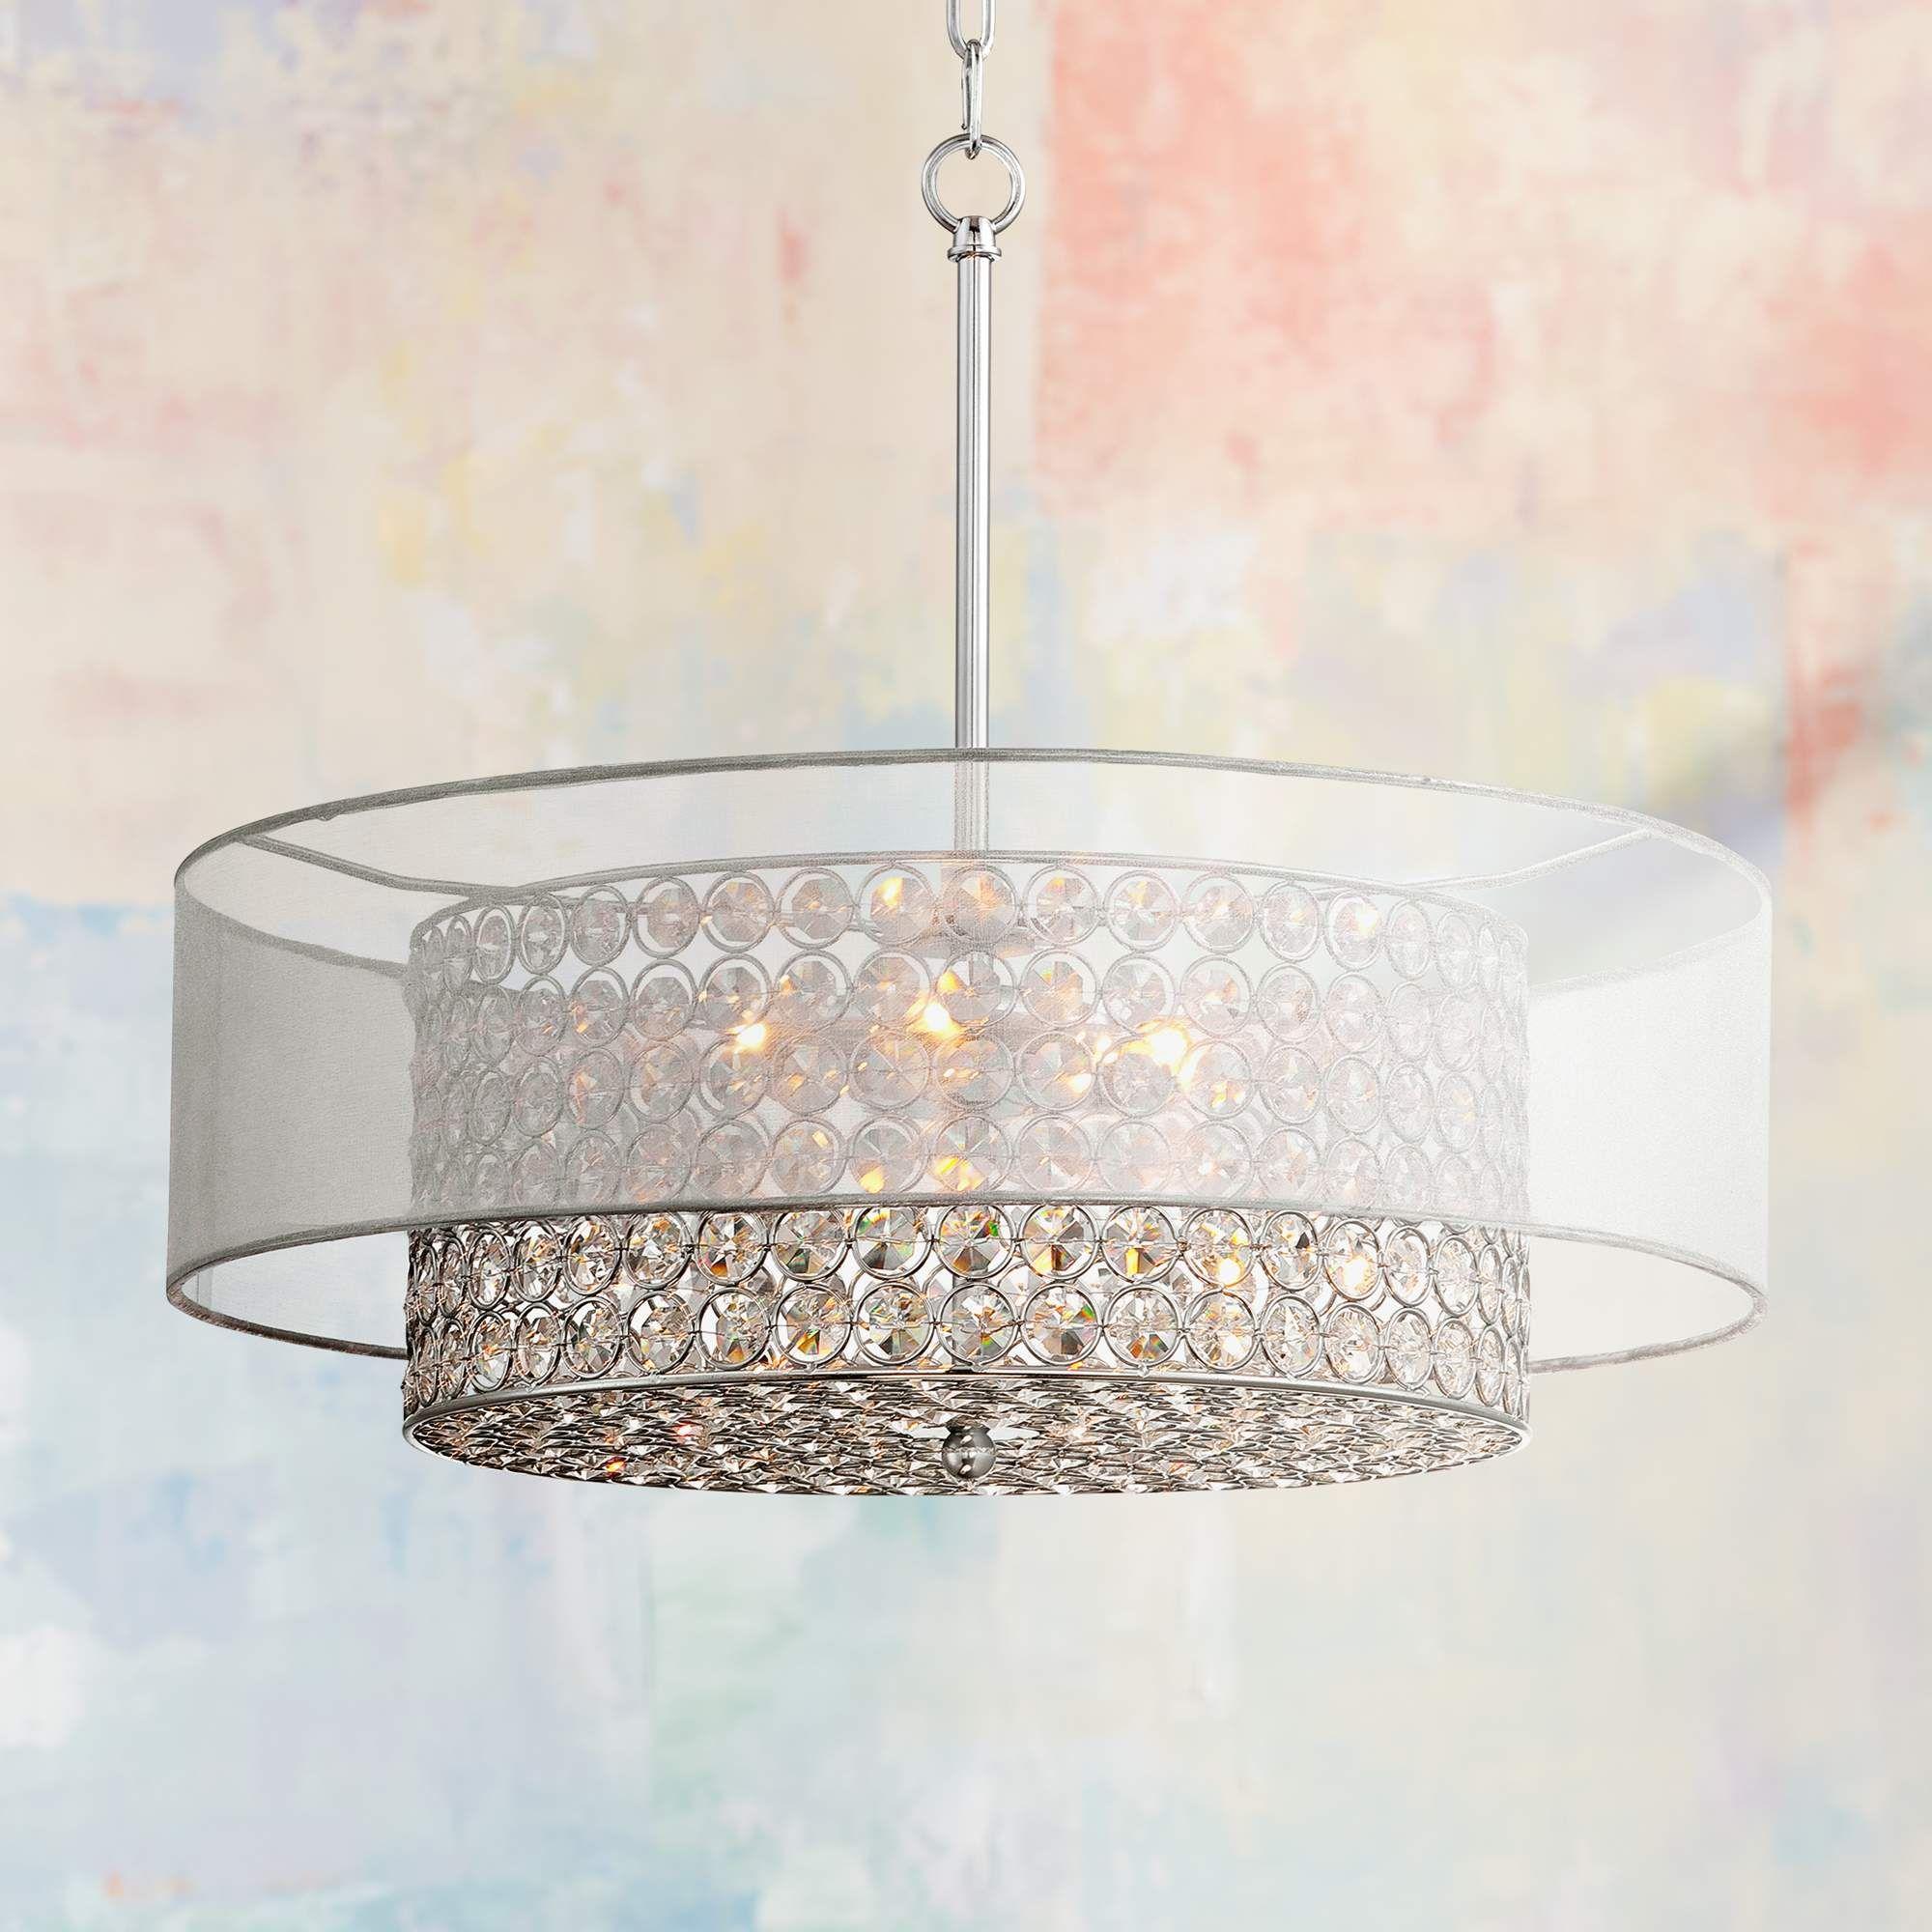 Possini Euro Viviette 20  Wide Crystal Drum Pendant Light - #8G479 | L&s Plus  sc 1 st  Pinterest & Possini Euro Viviette 20